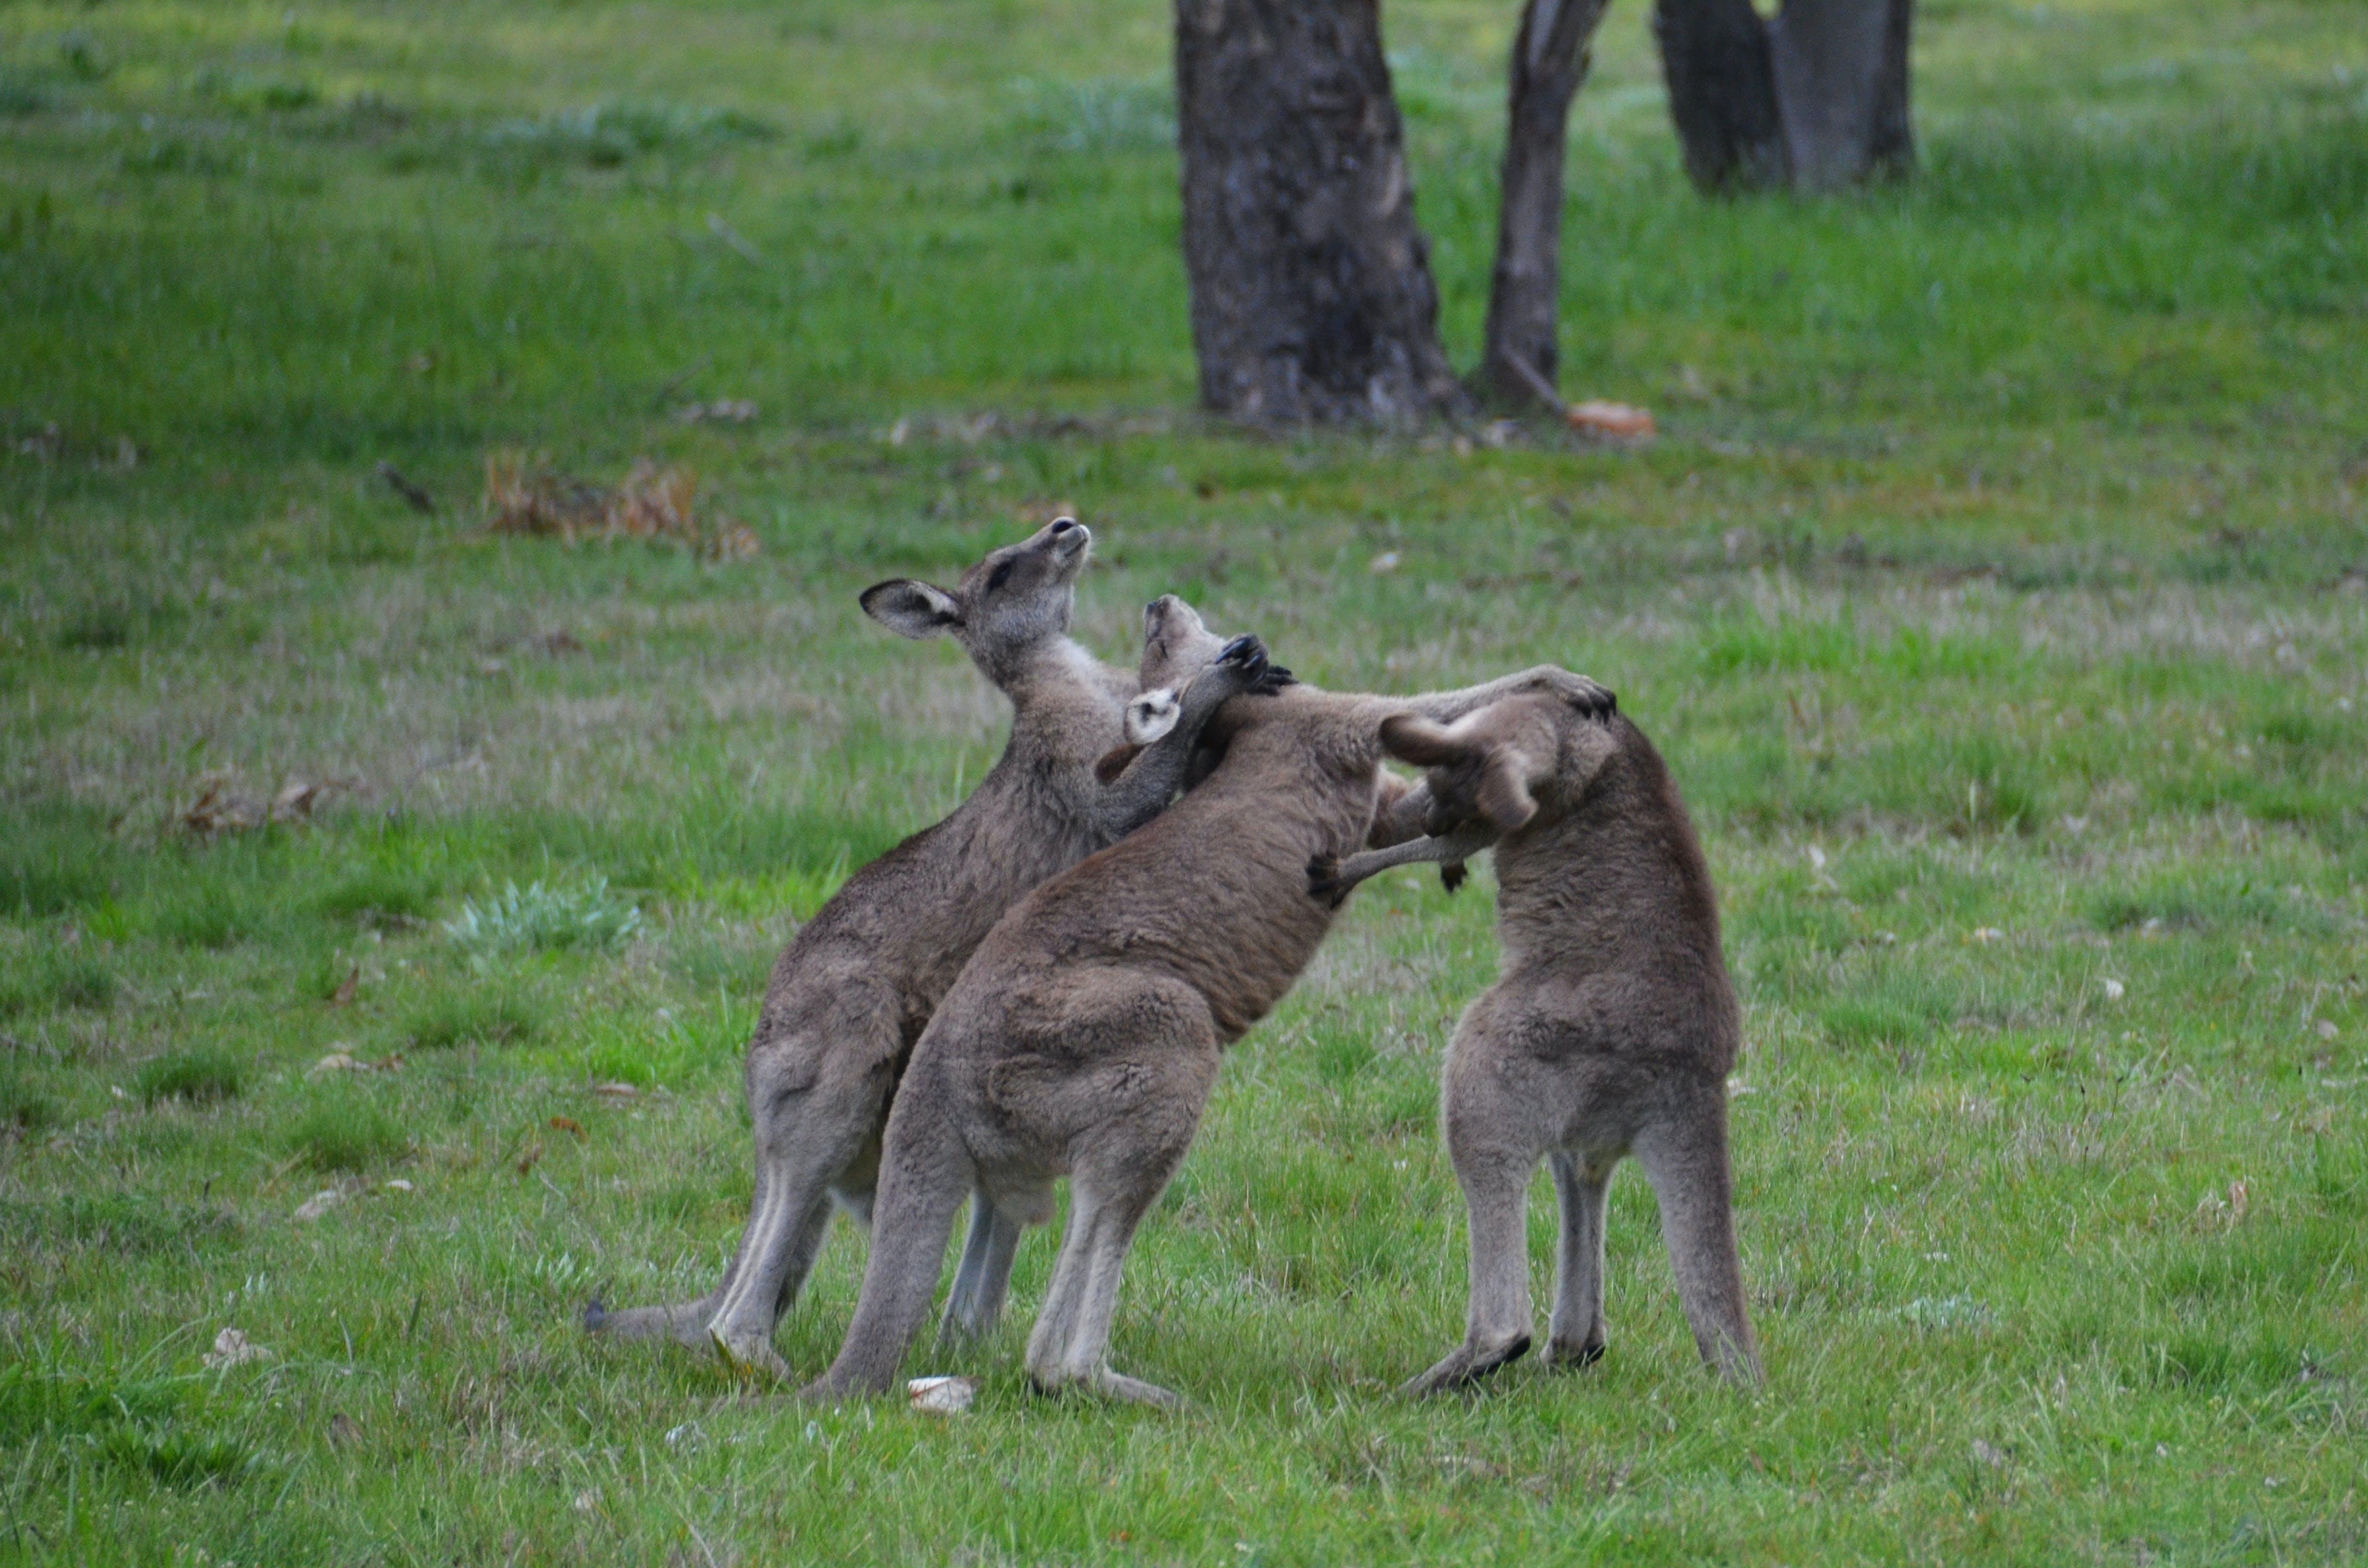 Free stock photo of 3 male kangaroos fighting